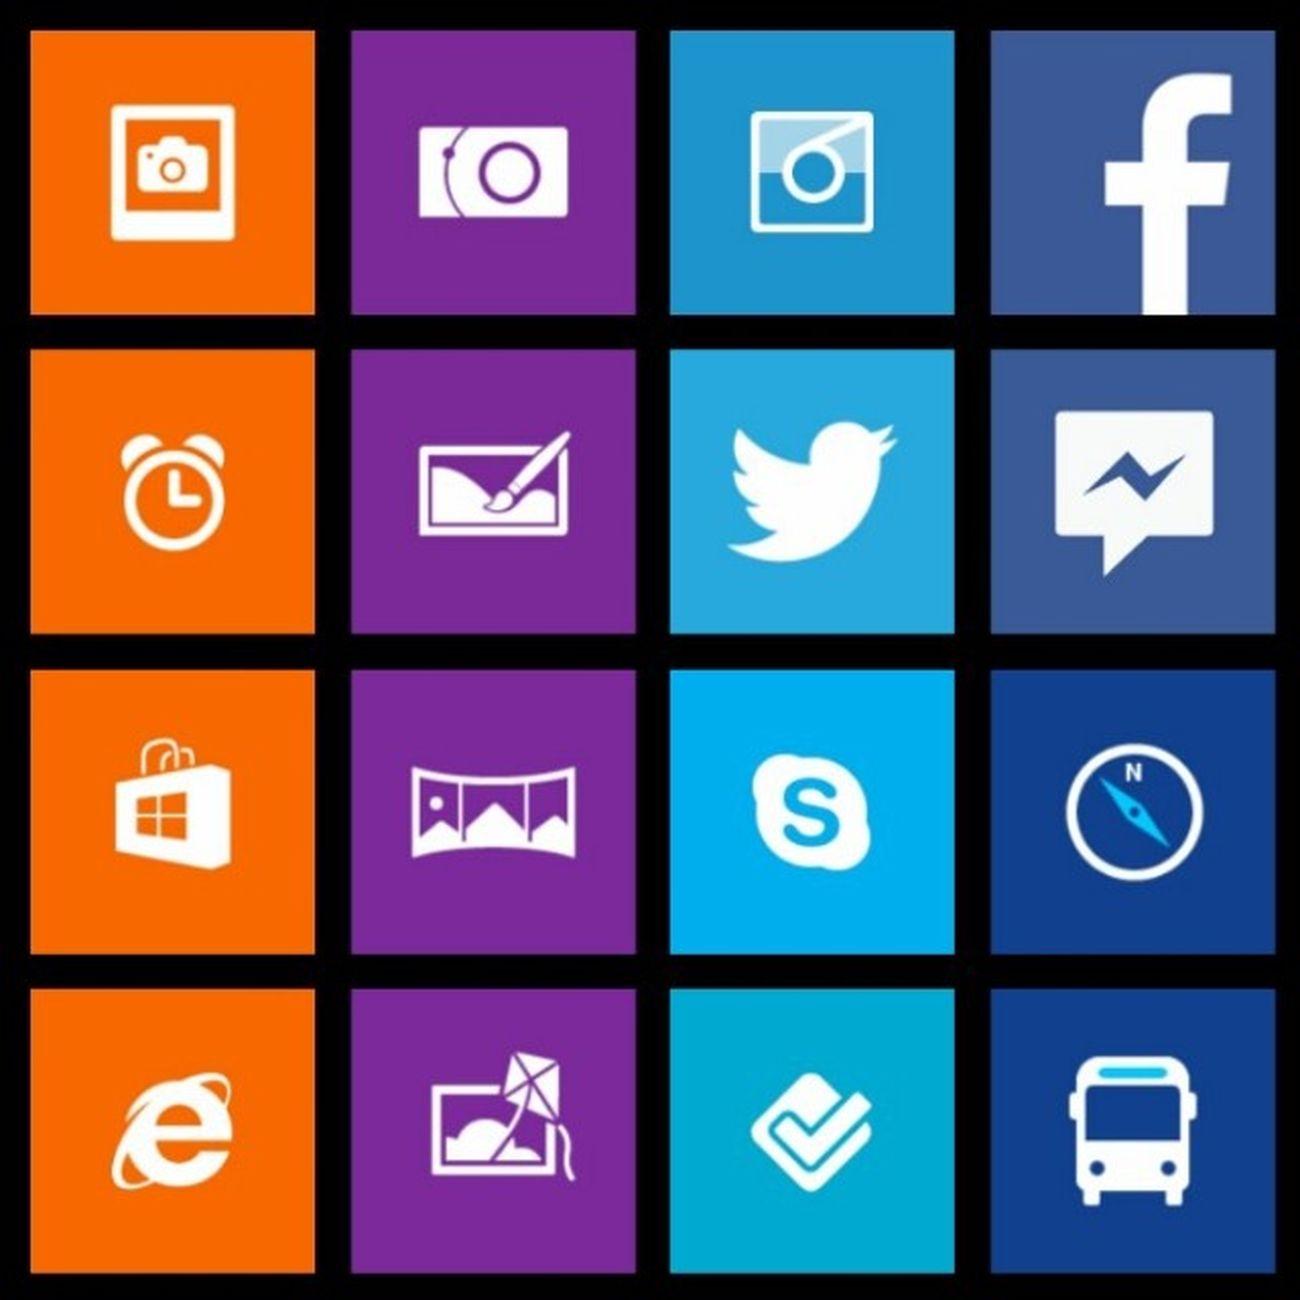 Metroui WP8 Windowsphone8 Nokia  lumia1020